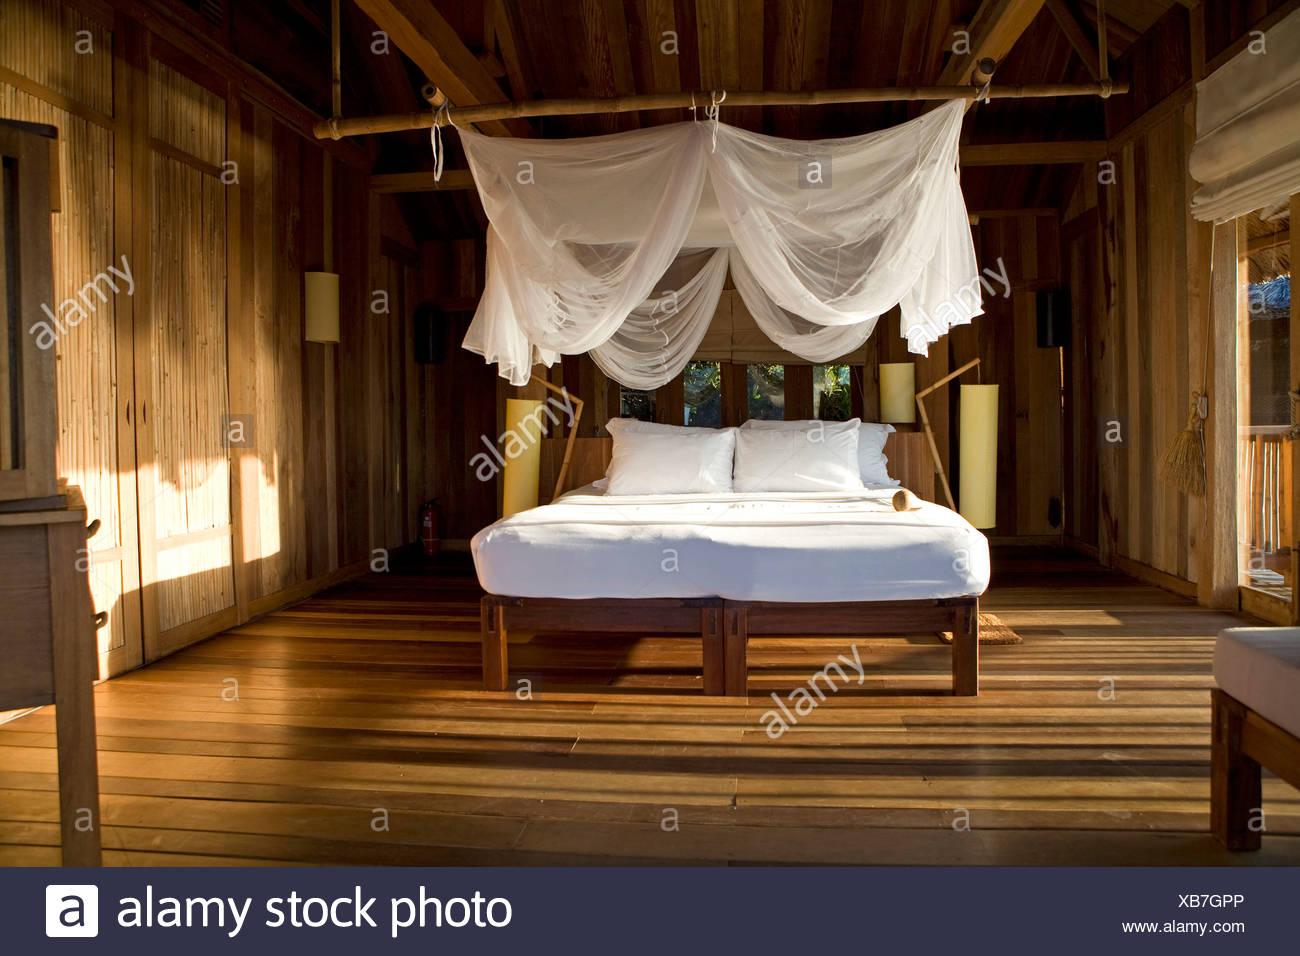 Hotel room, Nha Trang, Vietnam - Stock Image